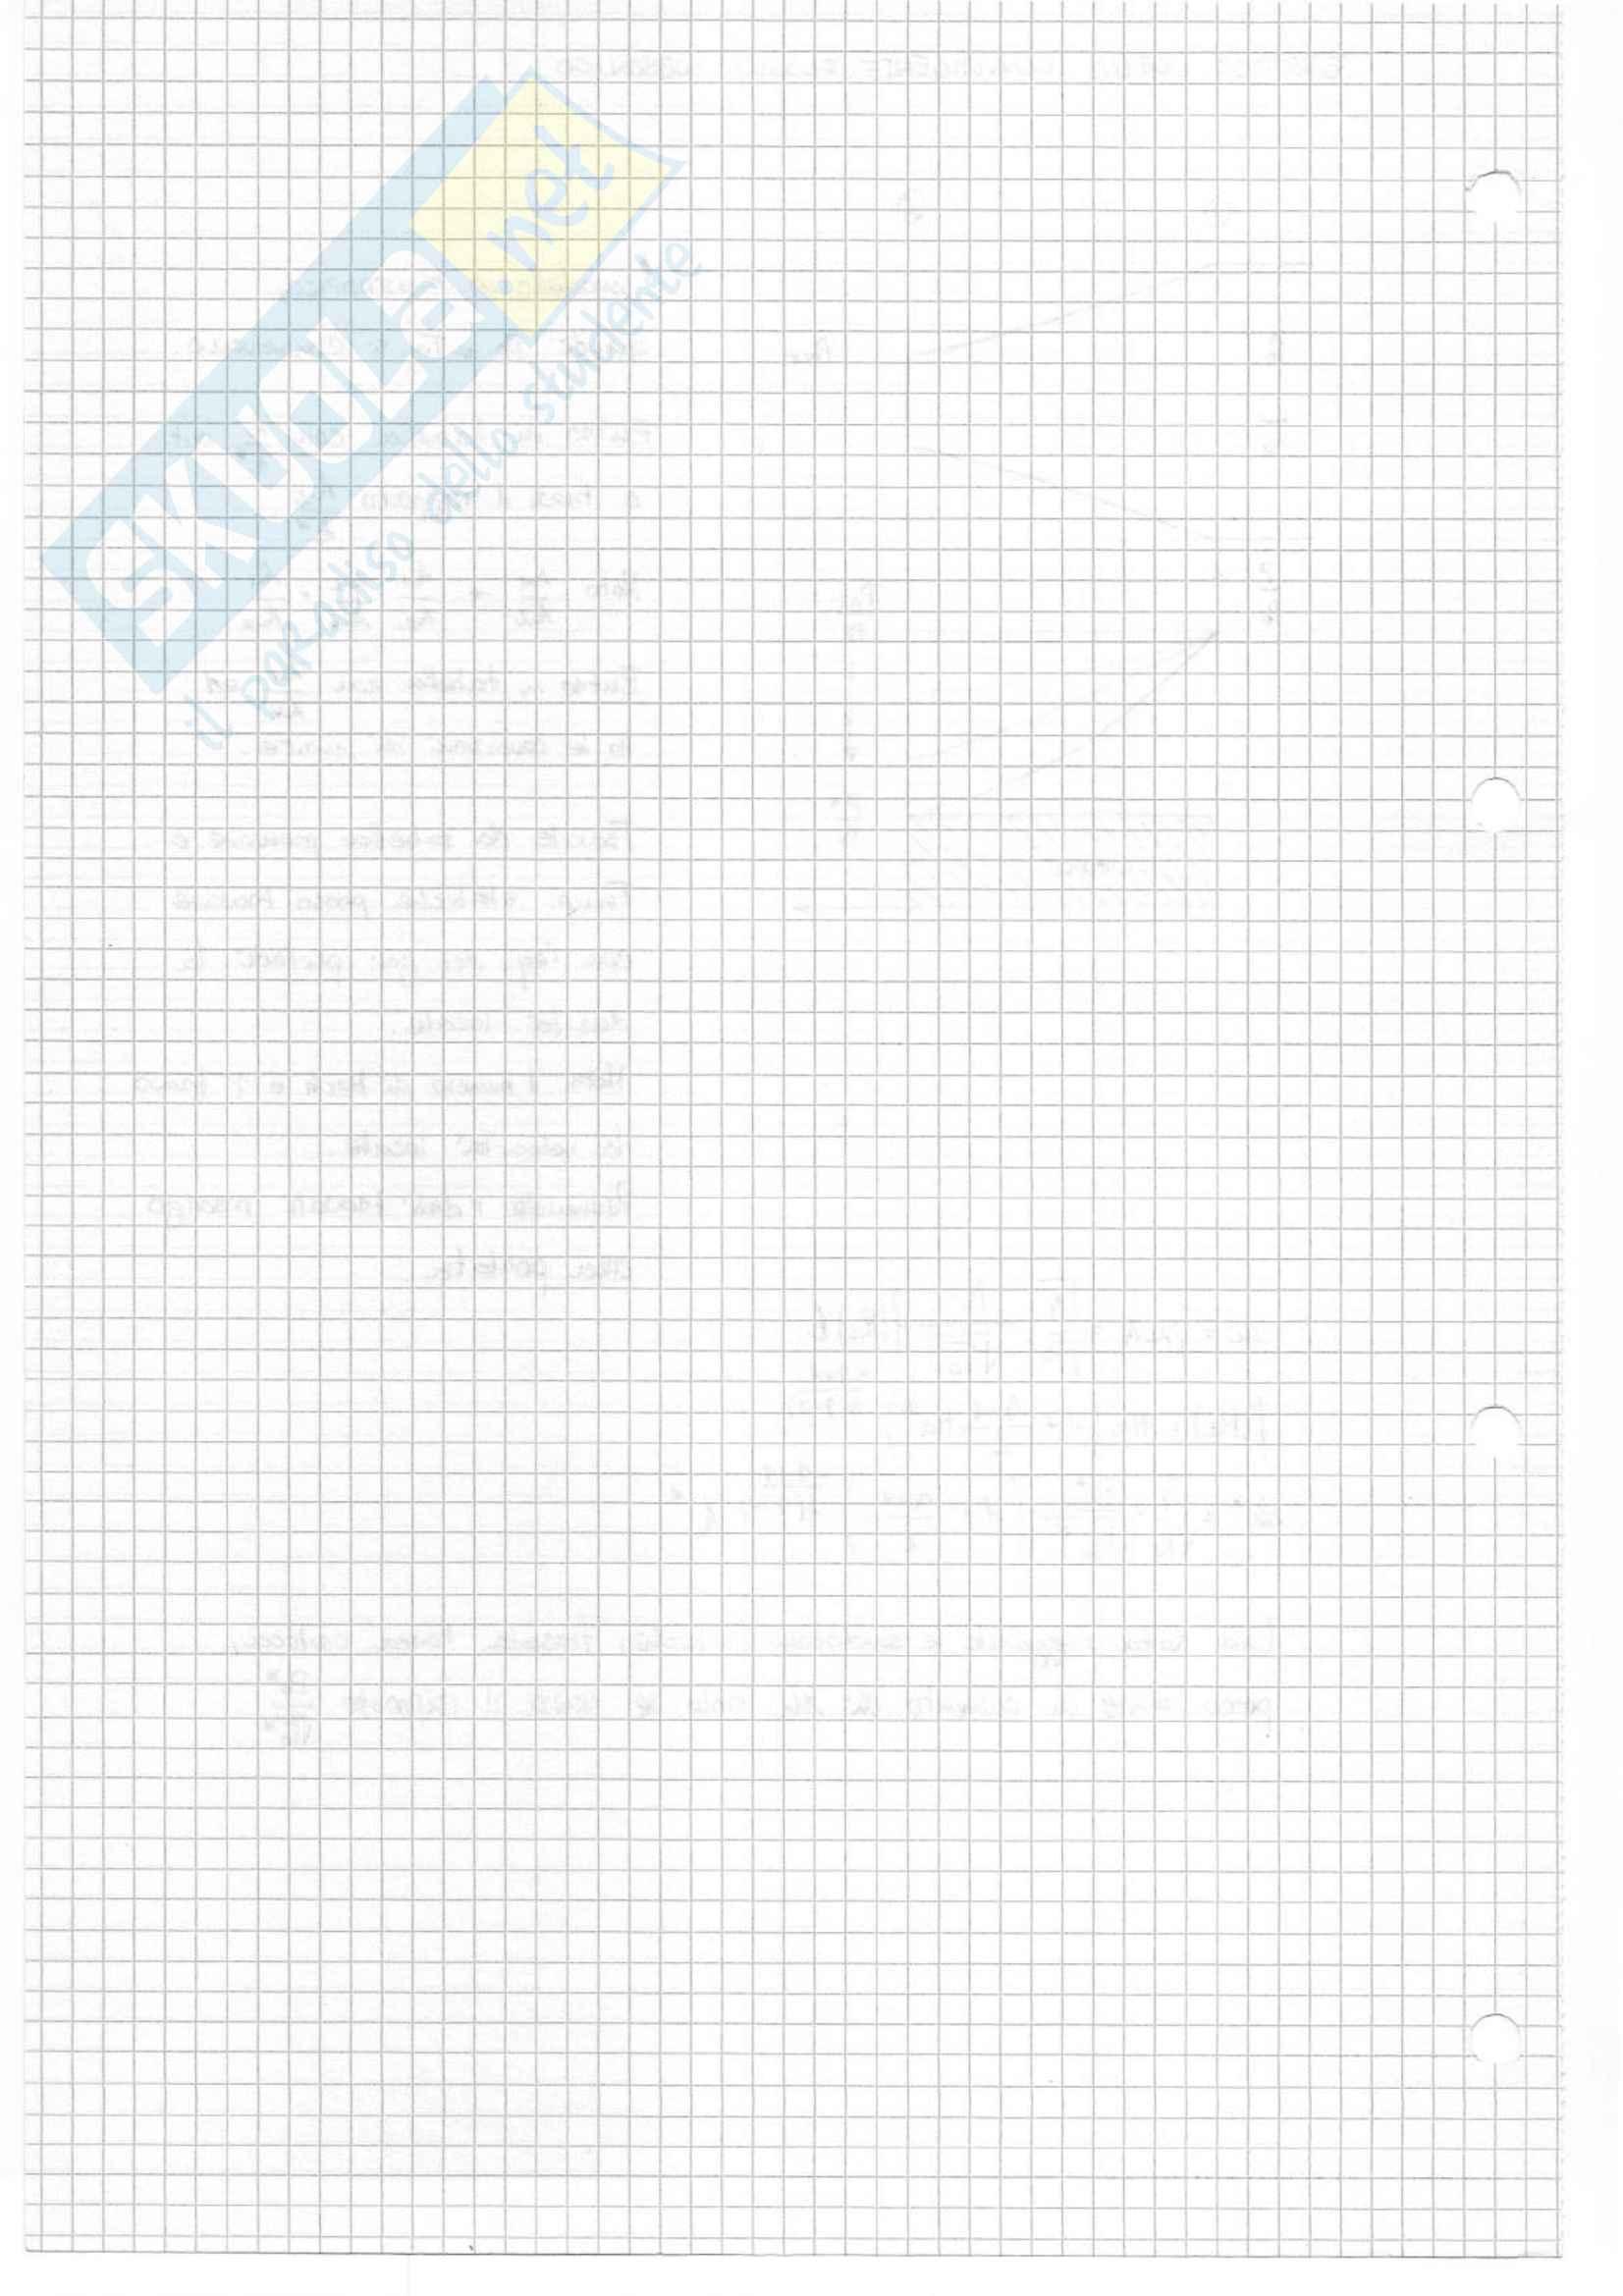 Appunti Fluidodinamica Pag. 46